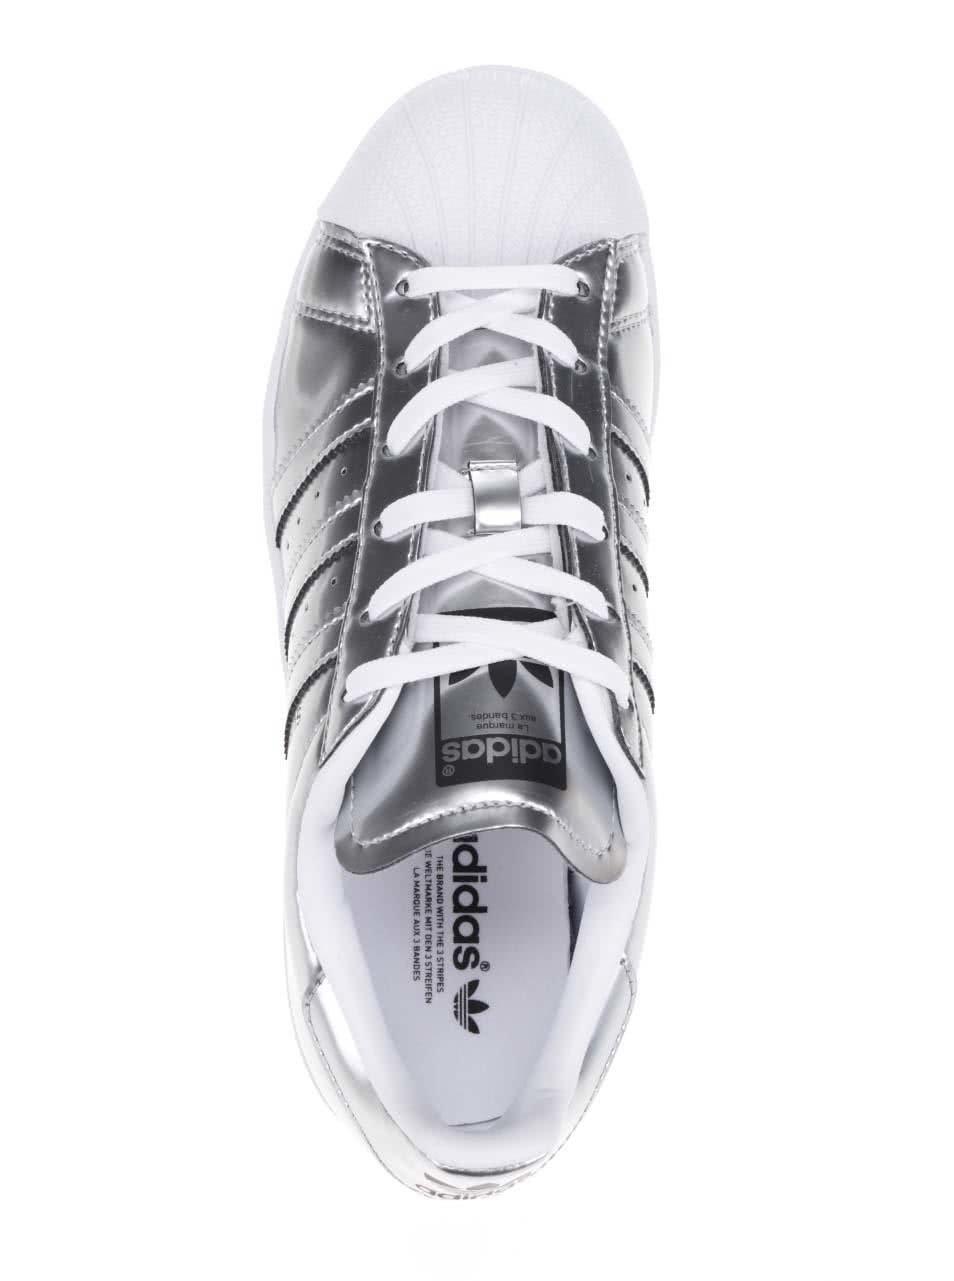 Dámské metalické tenisky v stříbrné barvě adidas Originals Superstar ... 9b97135c86